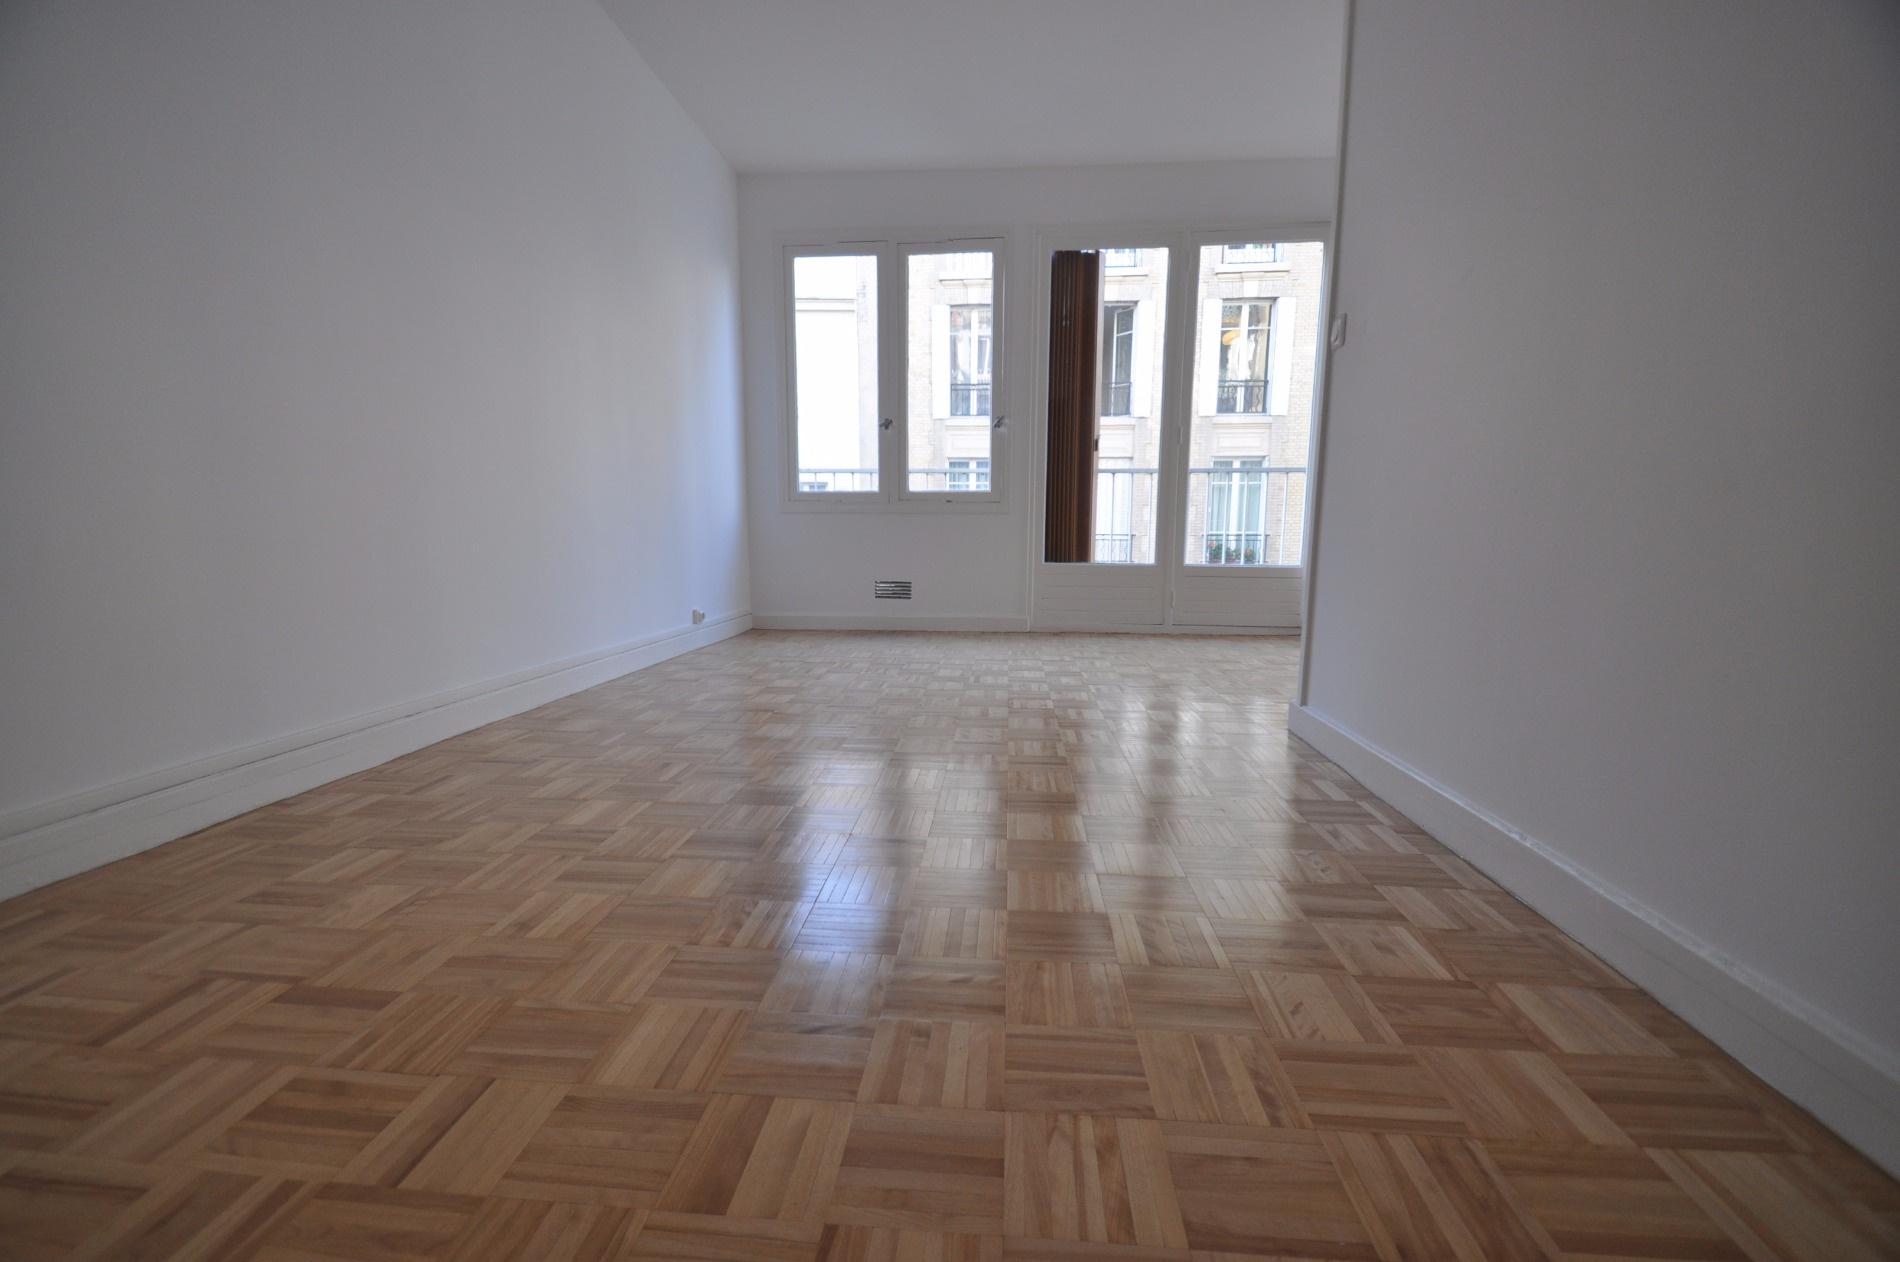 Offres de location Studio Paris (75015)